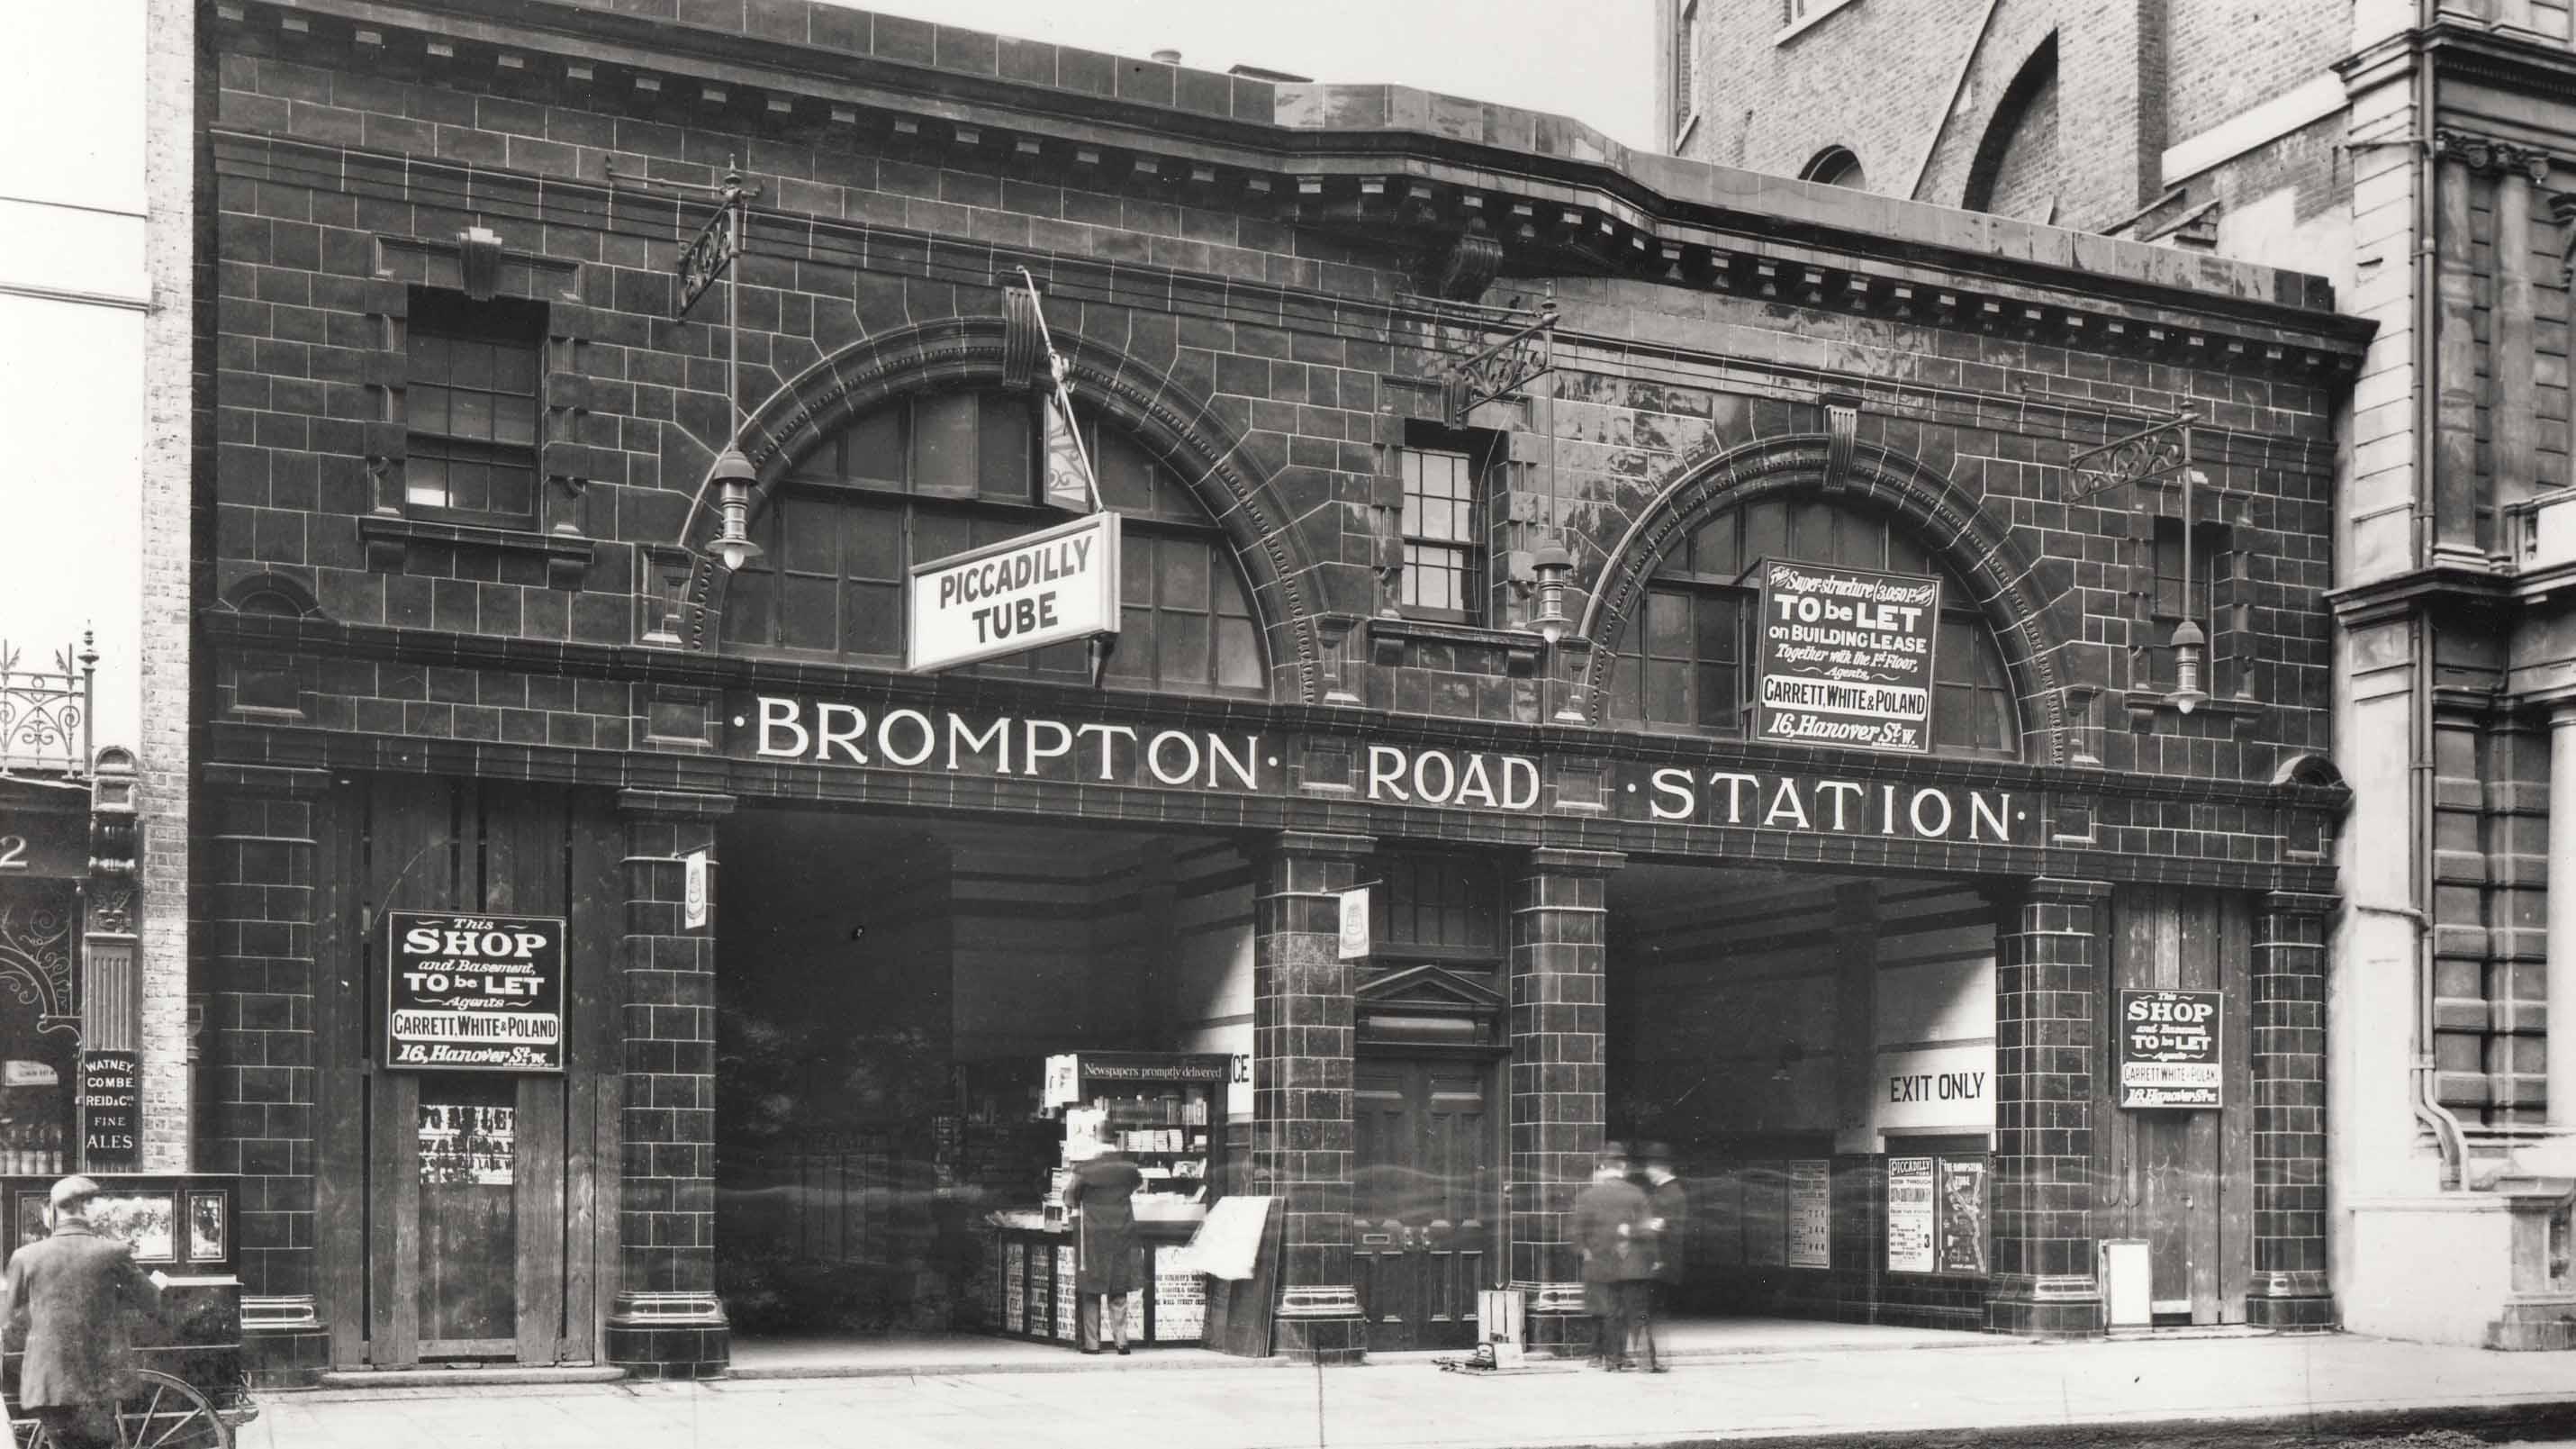 Brompton-Road-Underground-station--1907-copyright-TfL-2001-55802---2-